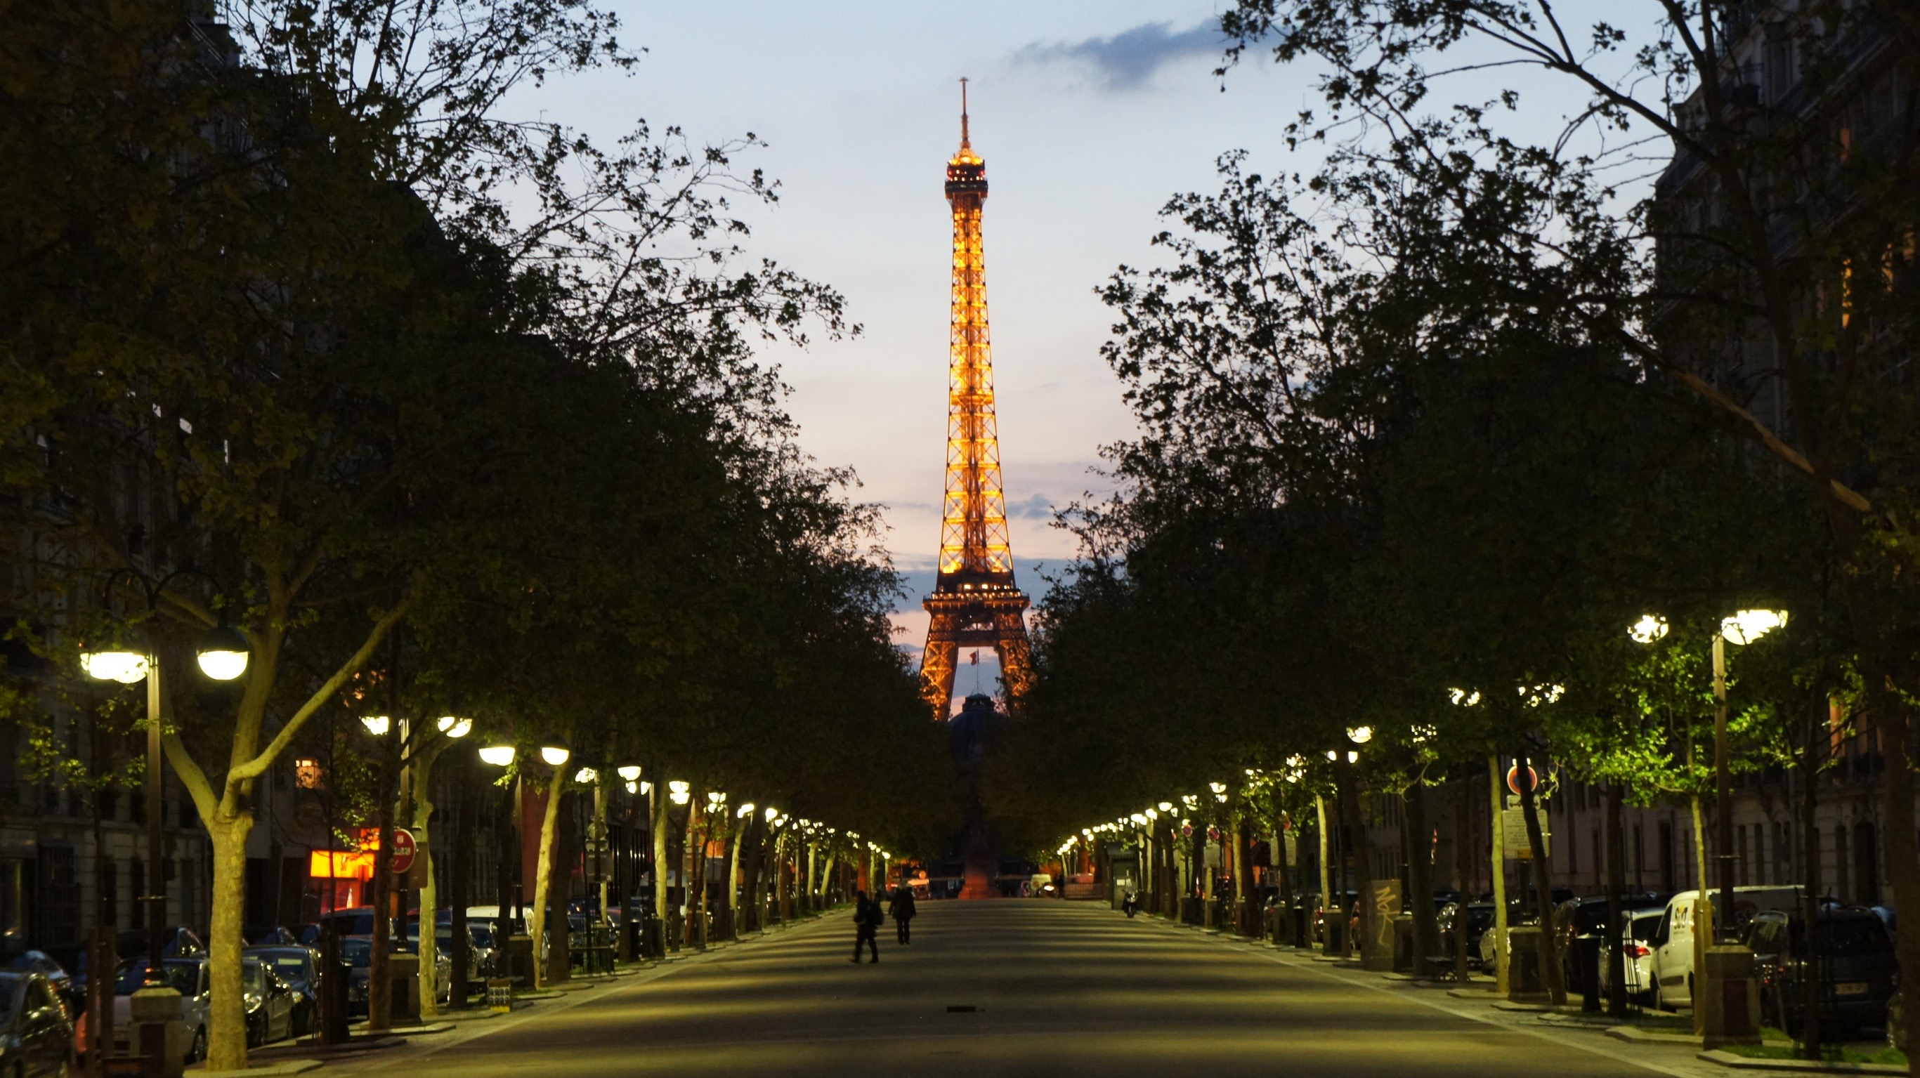 bfb126369d8 Tudo sobre Paris